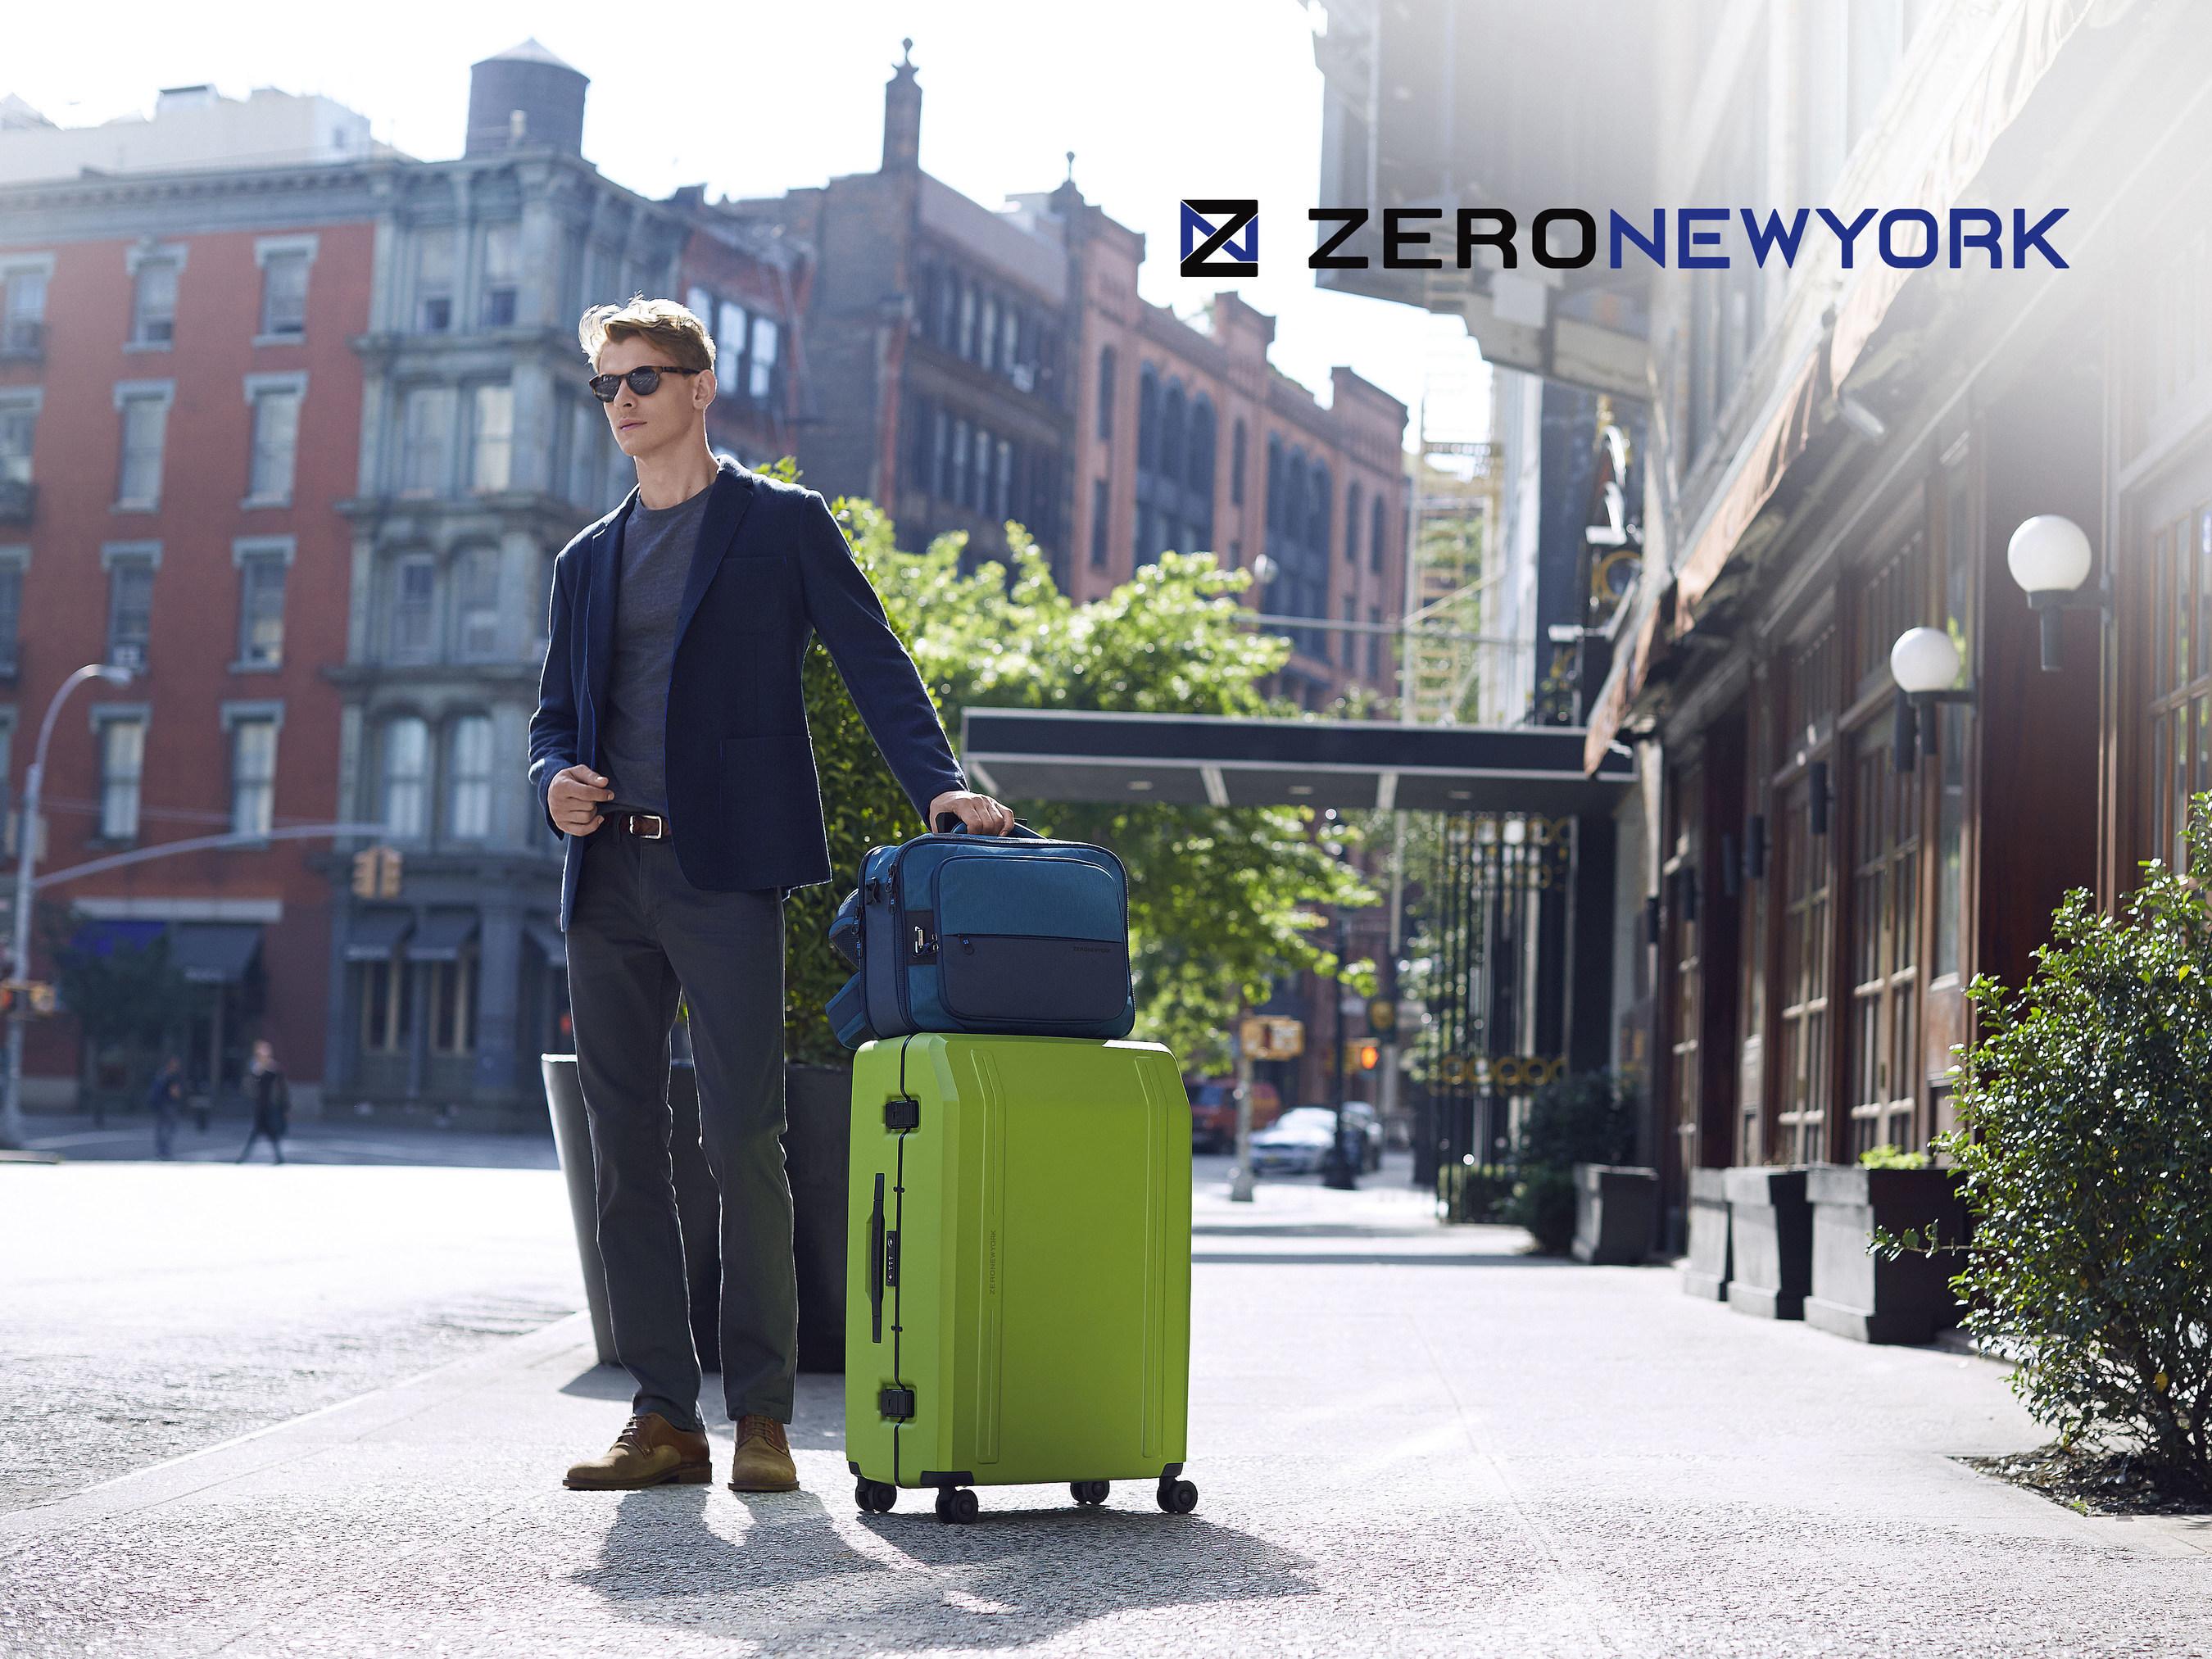 ZERO HALLIBURTON, Inc  Proudly Introduces the ZERO NEW YORK